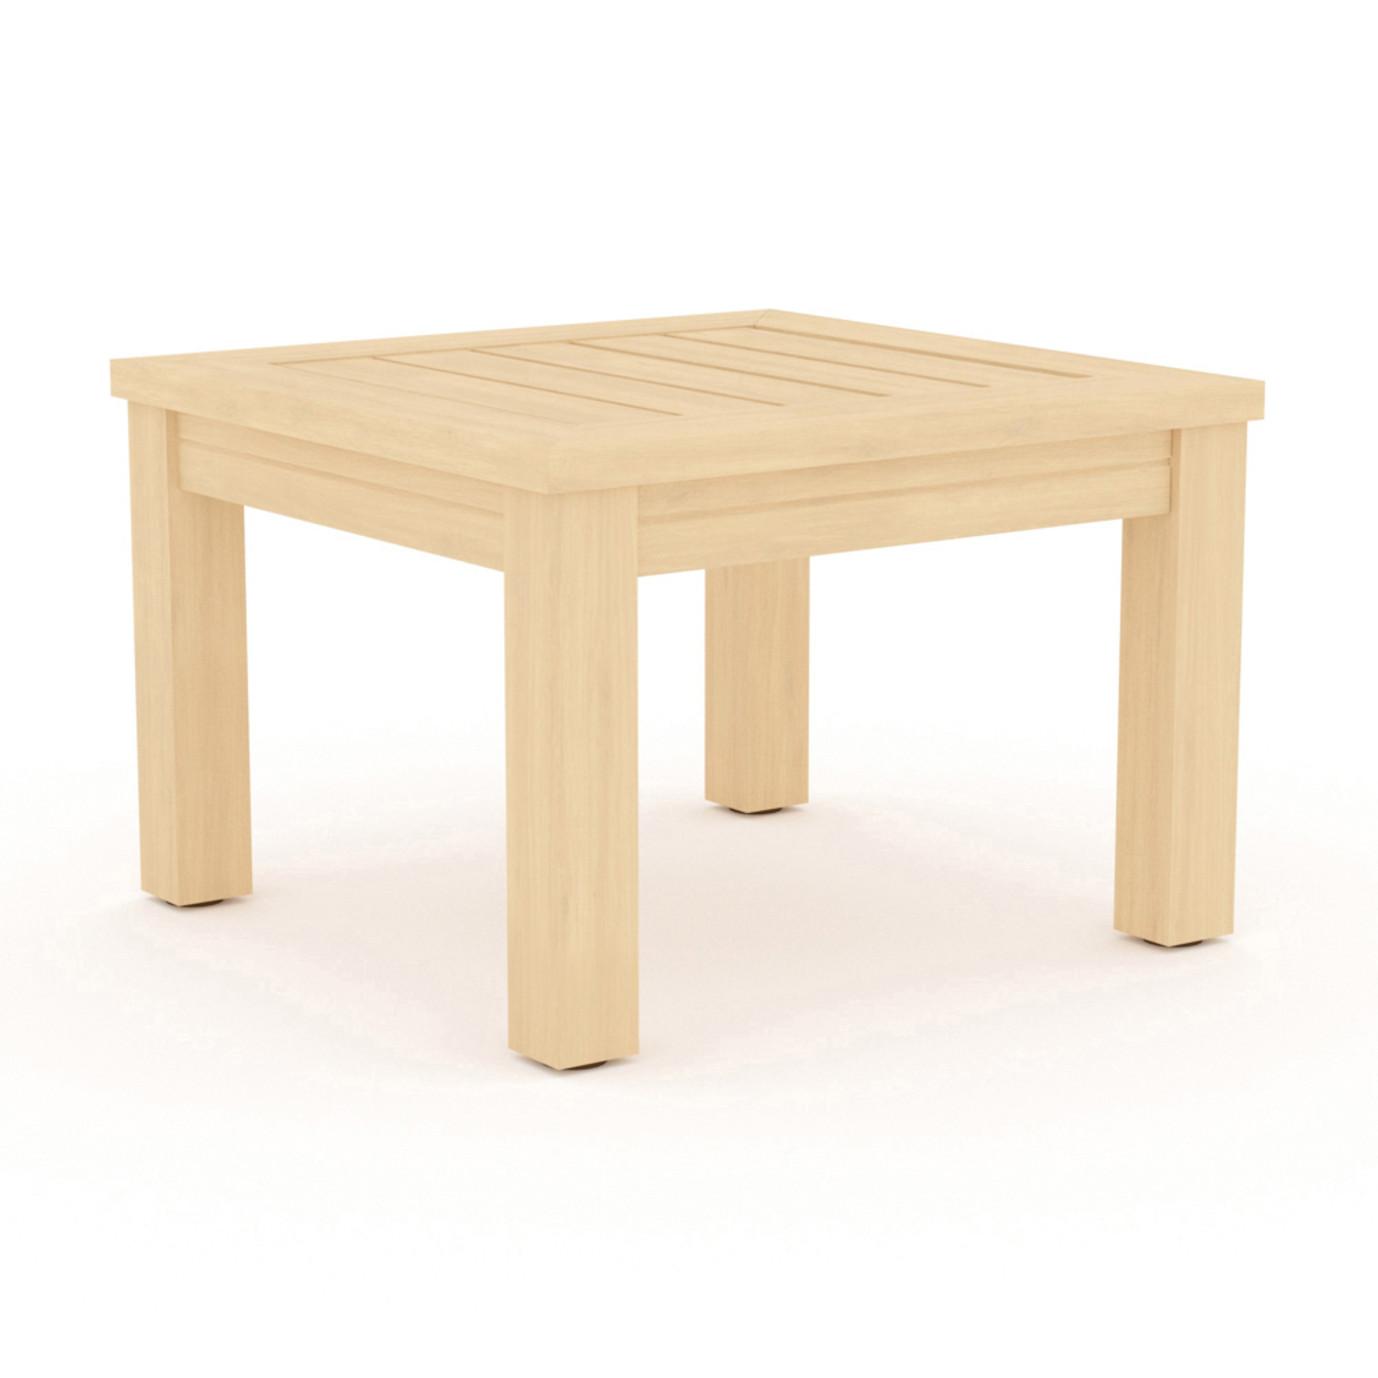 Benson 9 Piece Seating Set - Spa Blue